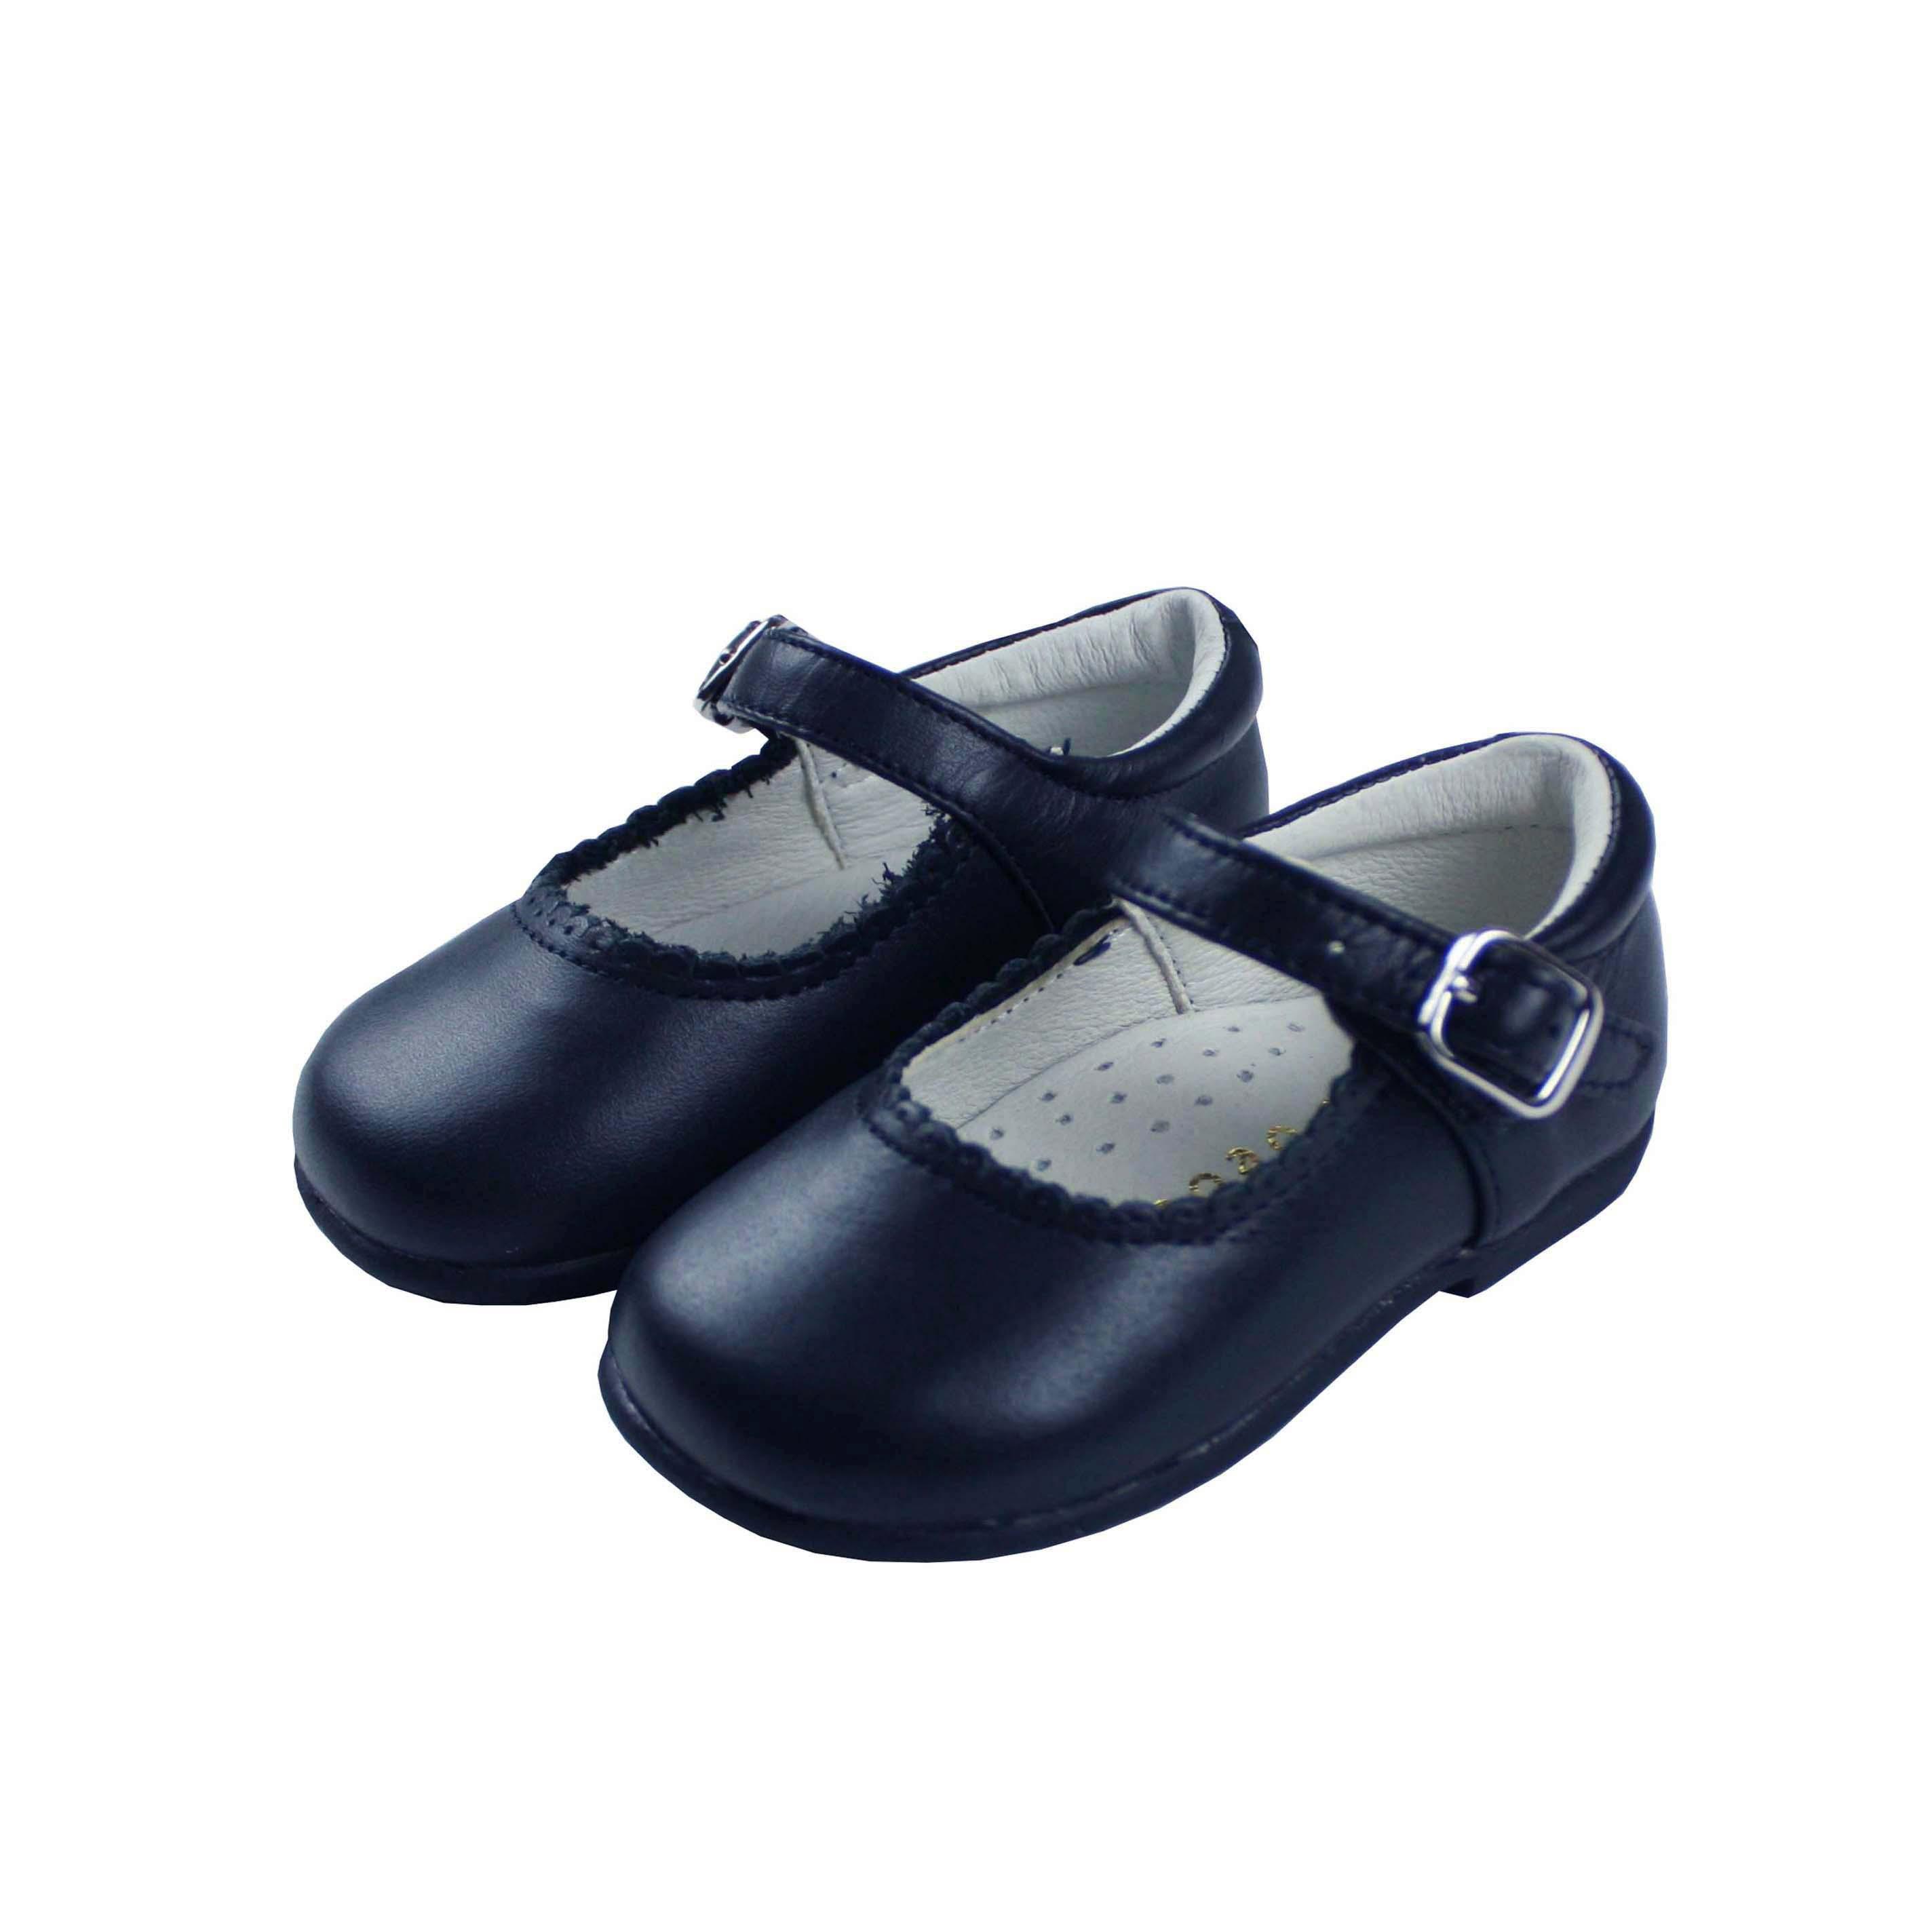 revisa 5320b 943c2 Zapato piel mercedita azul marino